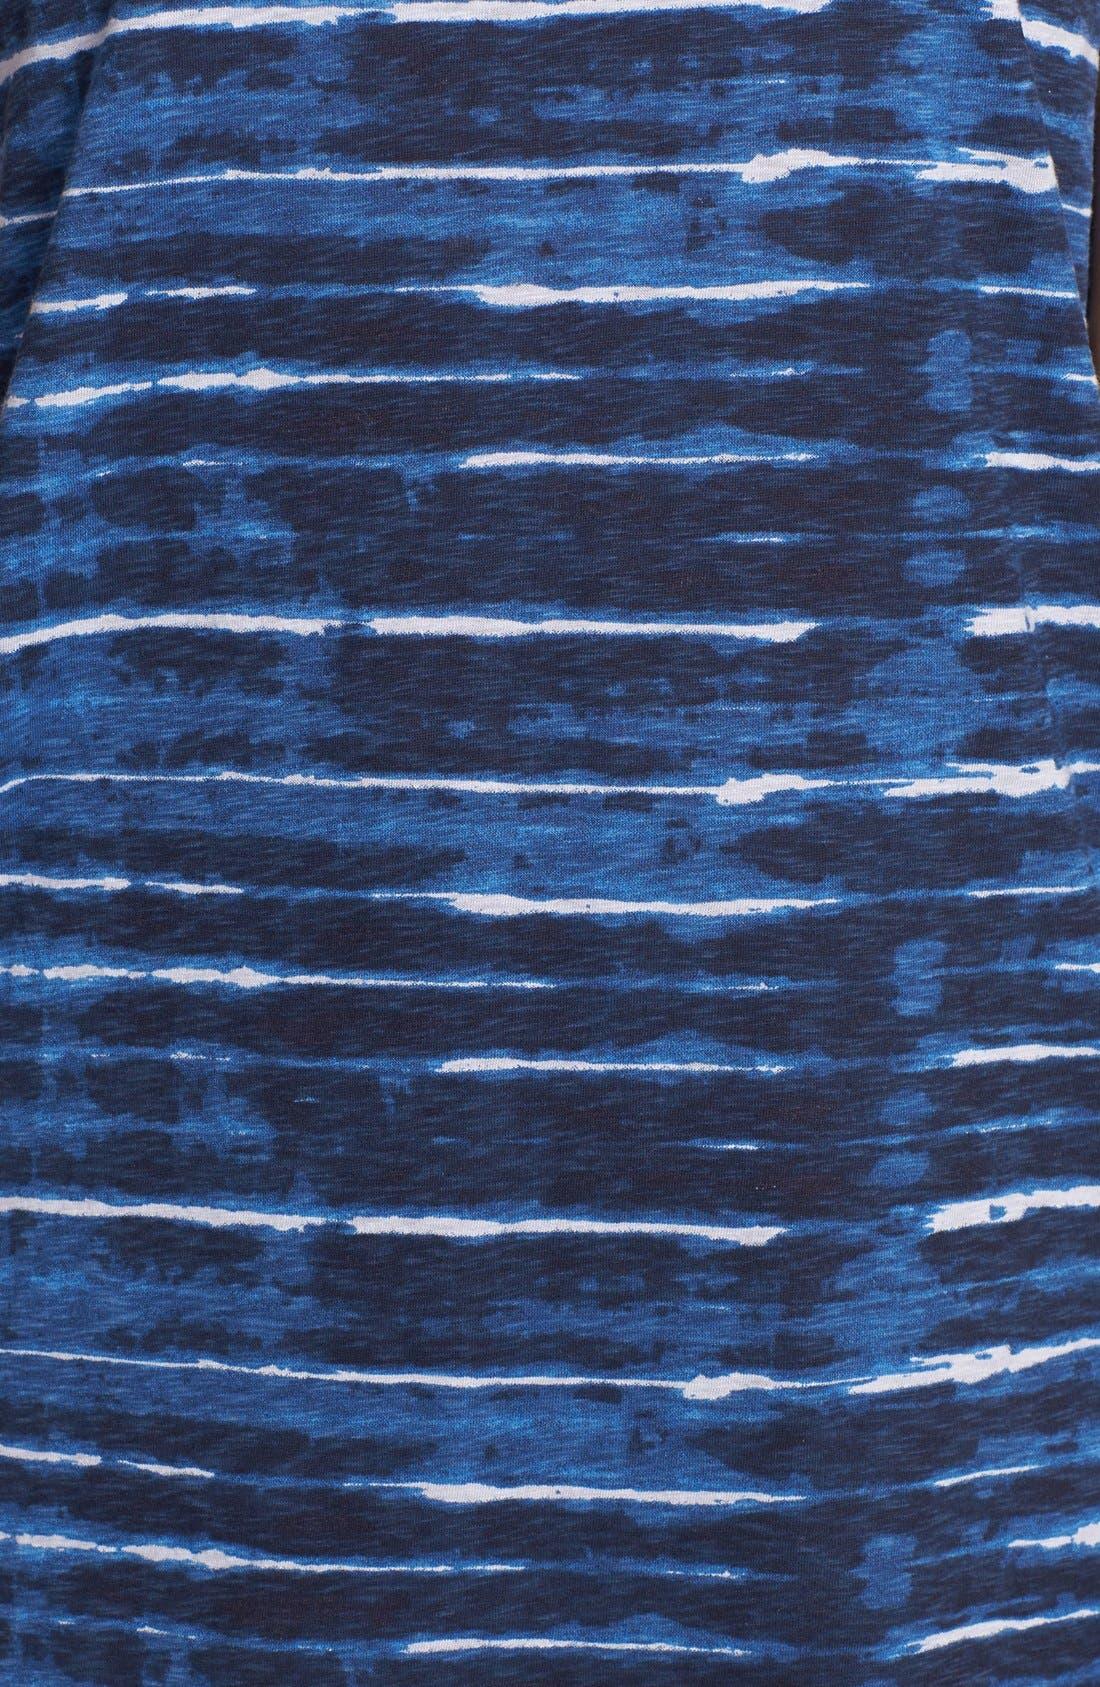 Alternate Image 3  - Soft Joie 'Jute' Tie Dye Cotton Dress